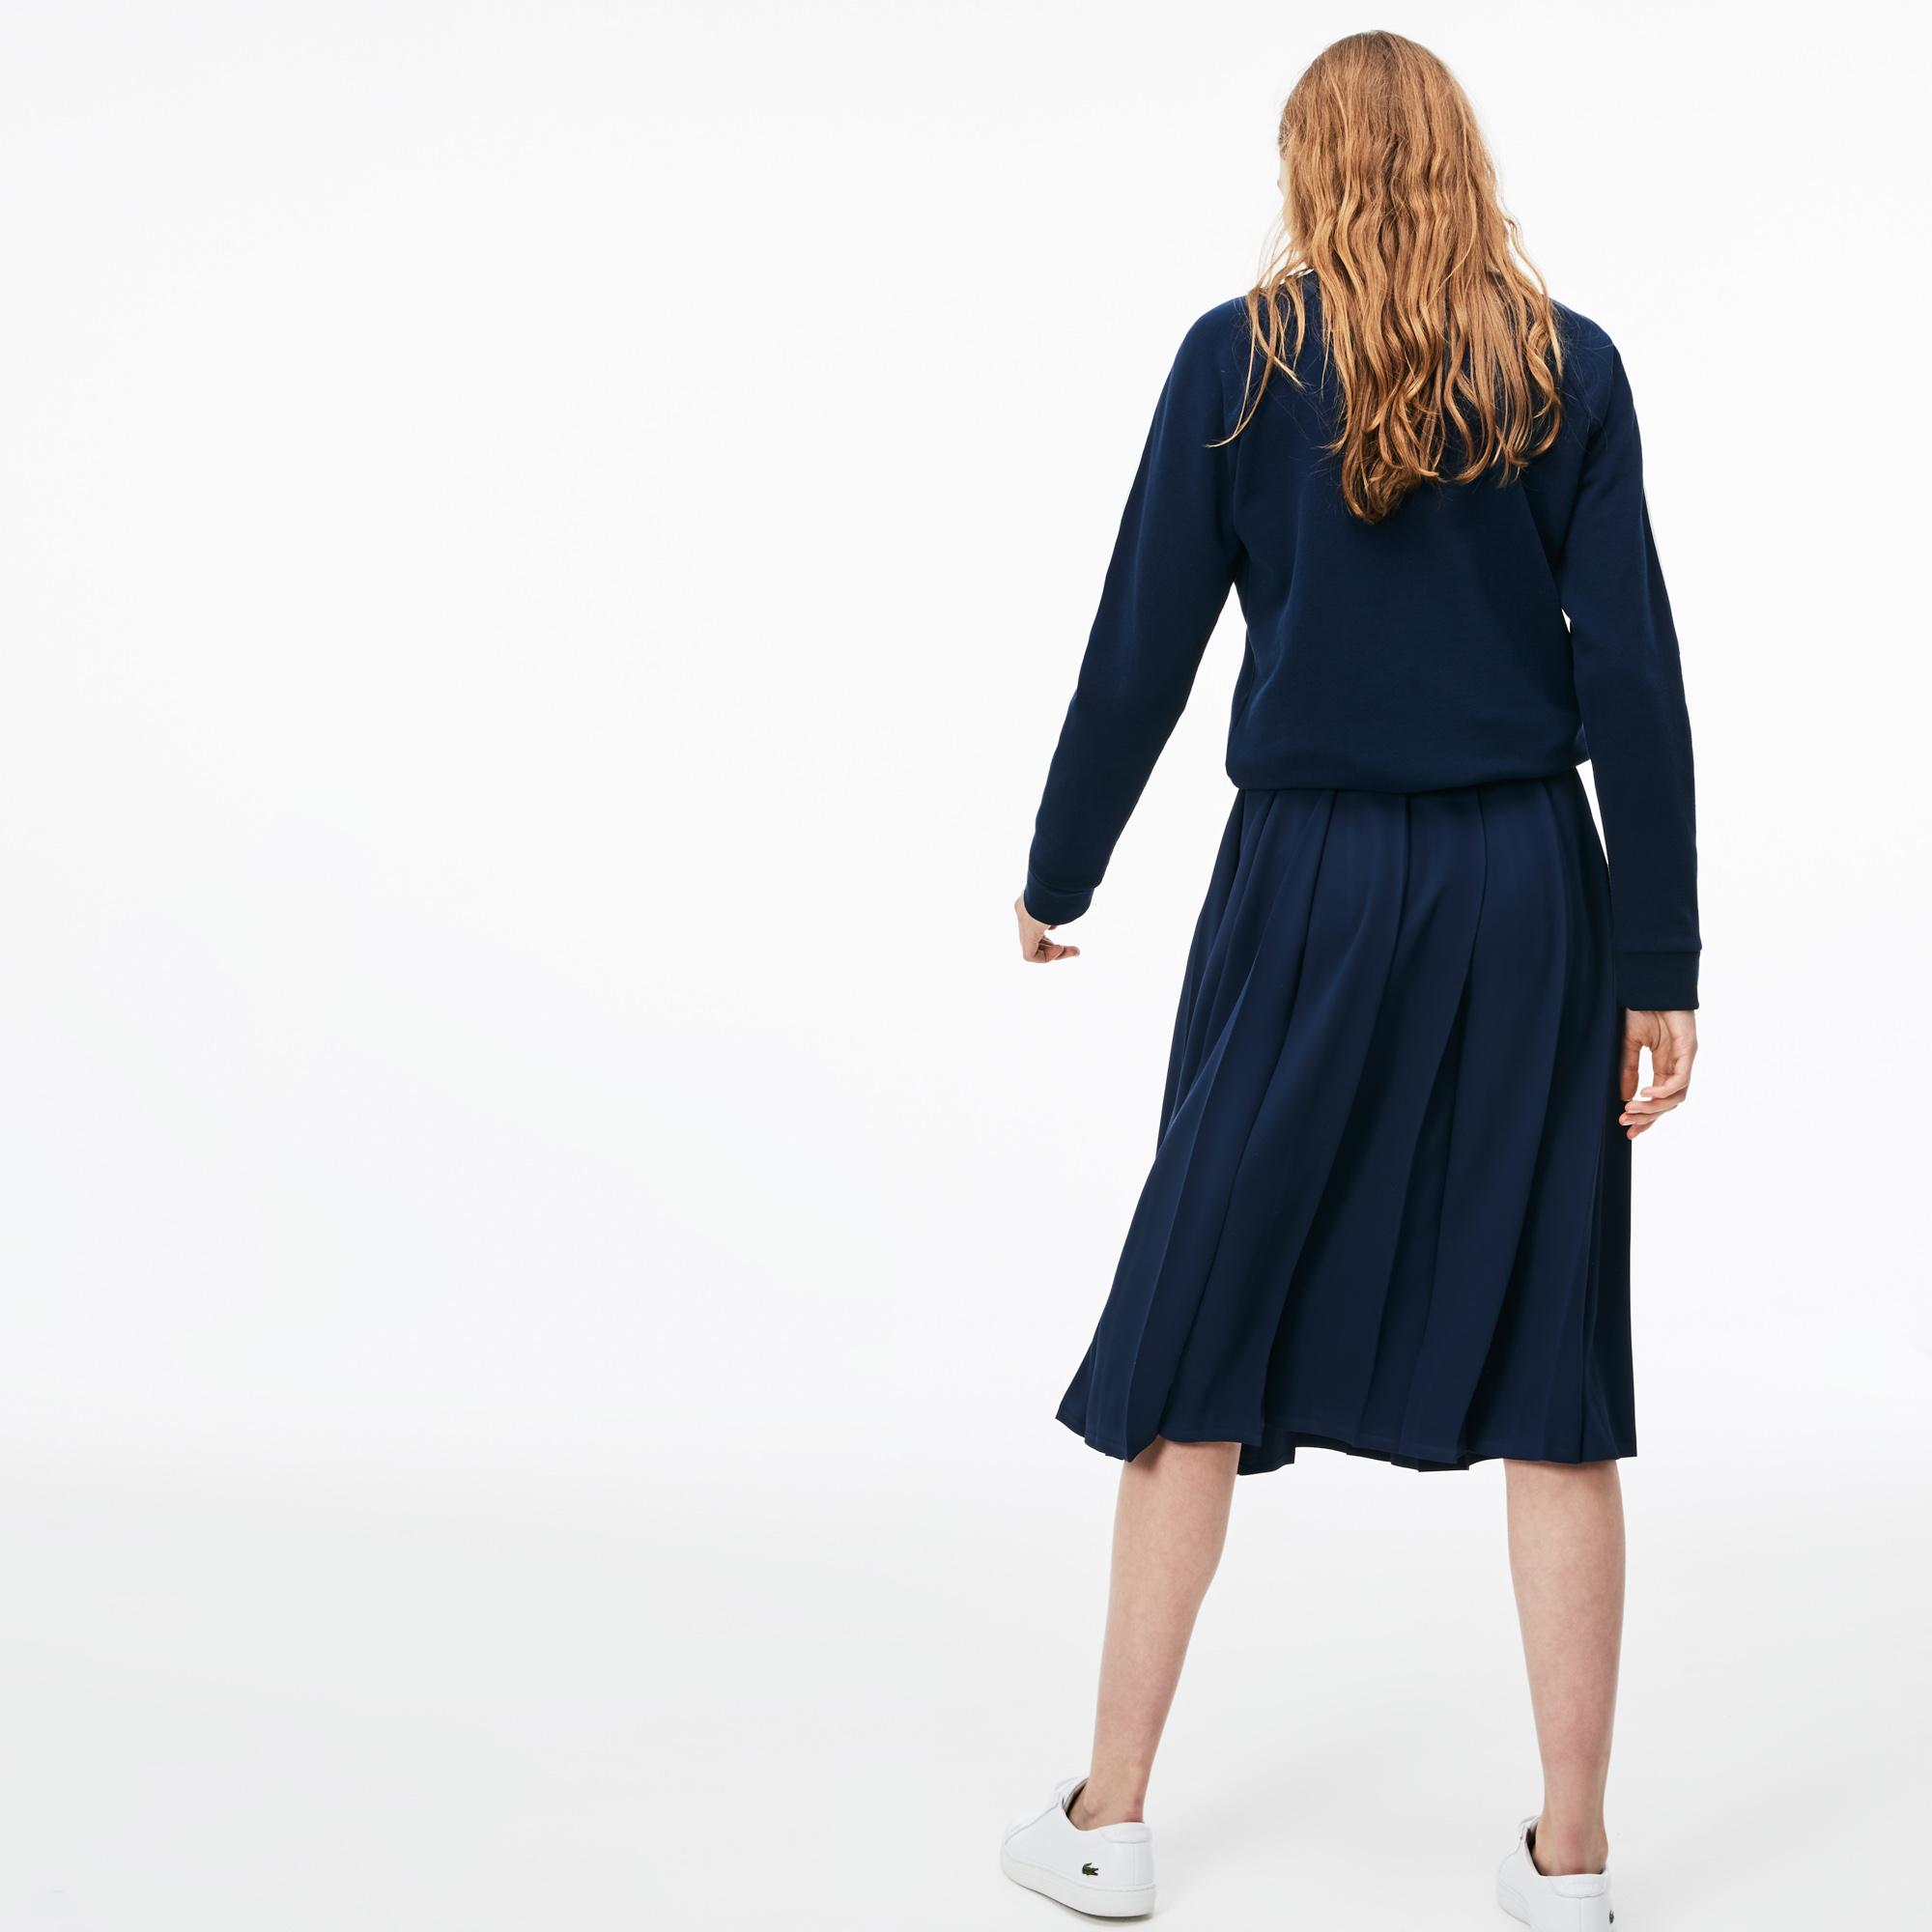 Фото 2 - Юбку Lacoste темно-синего цвета